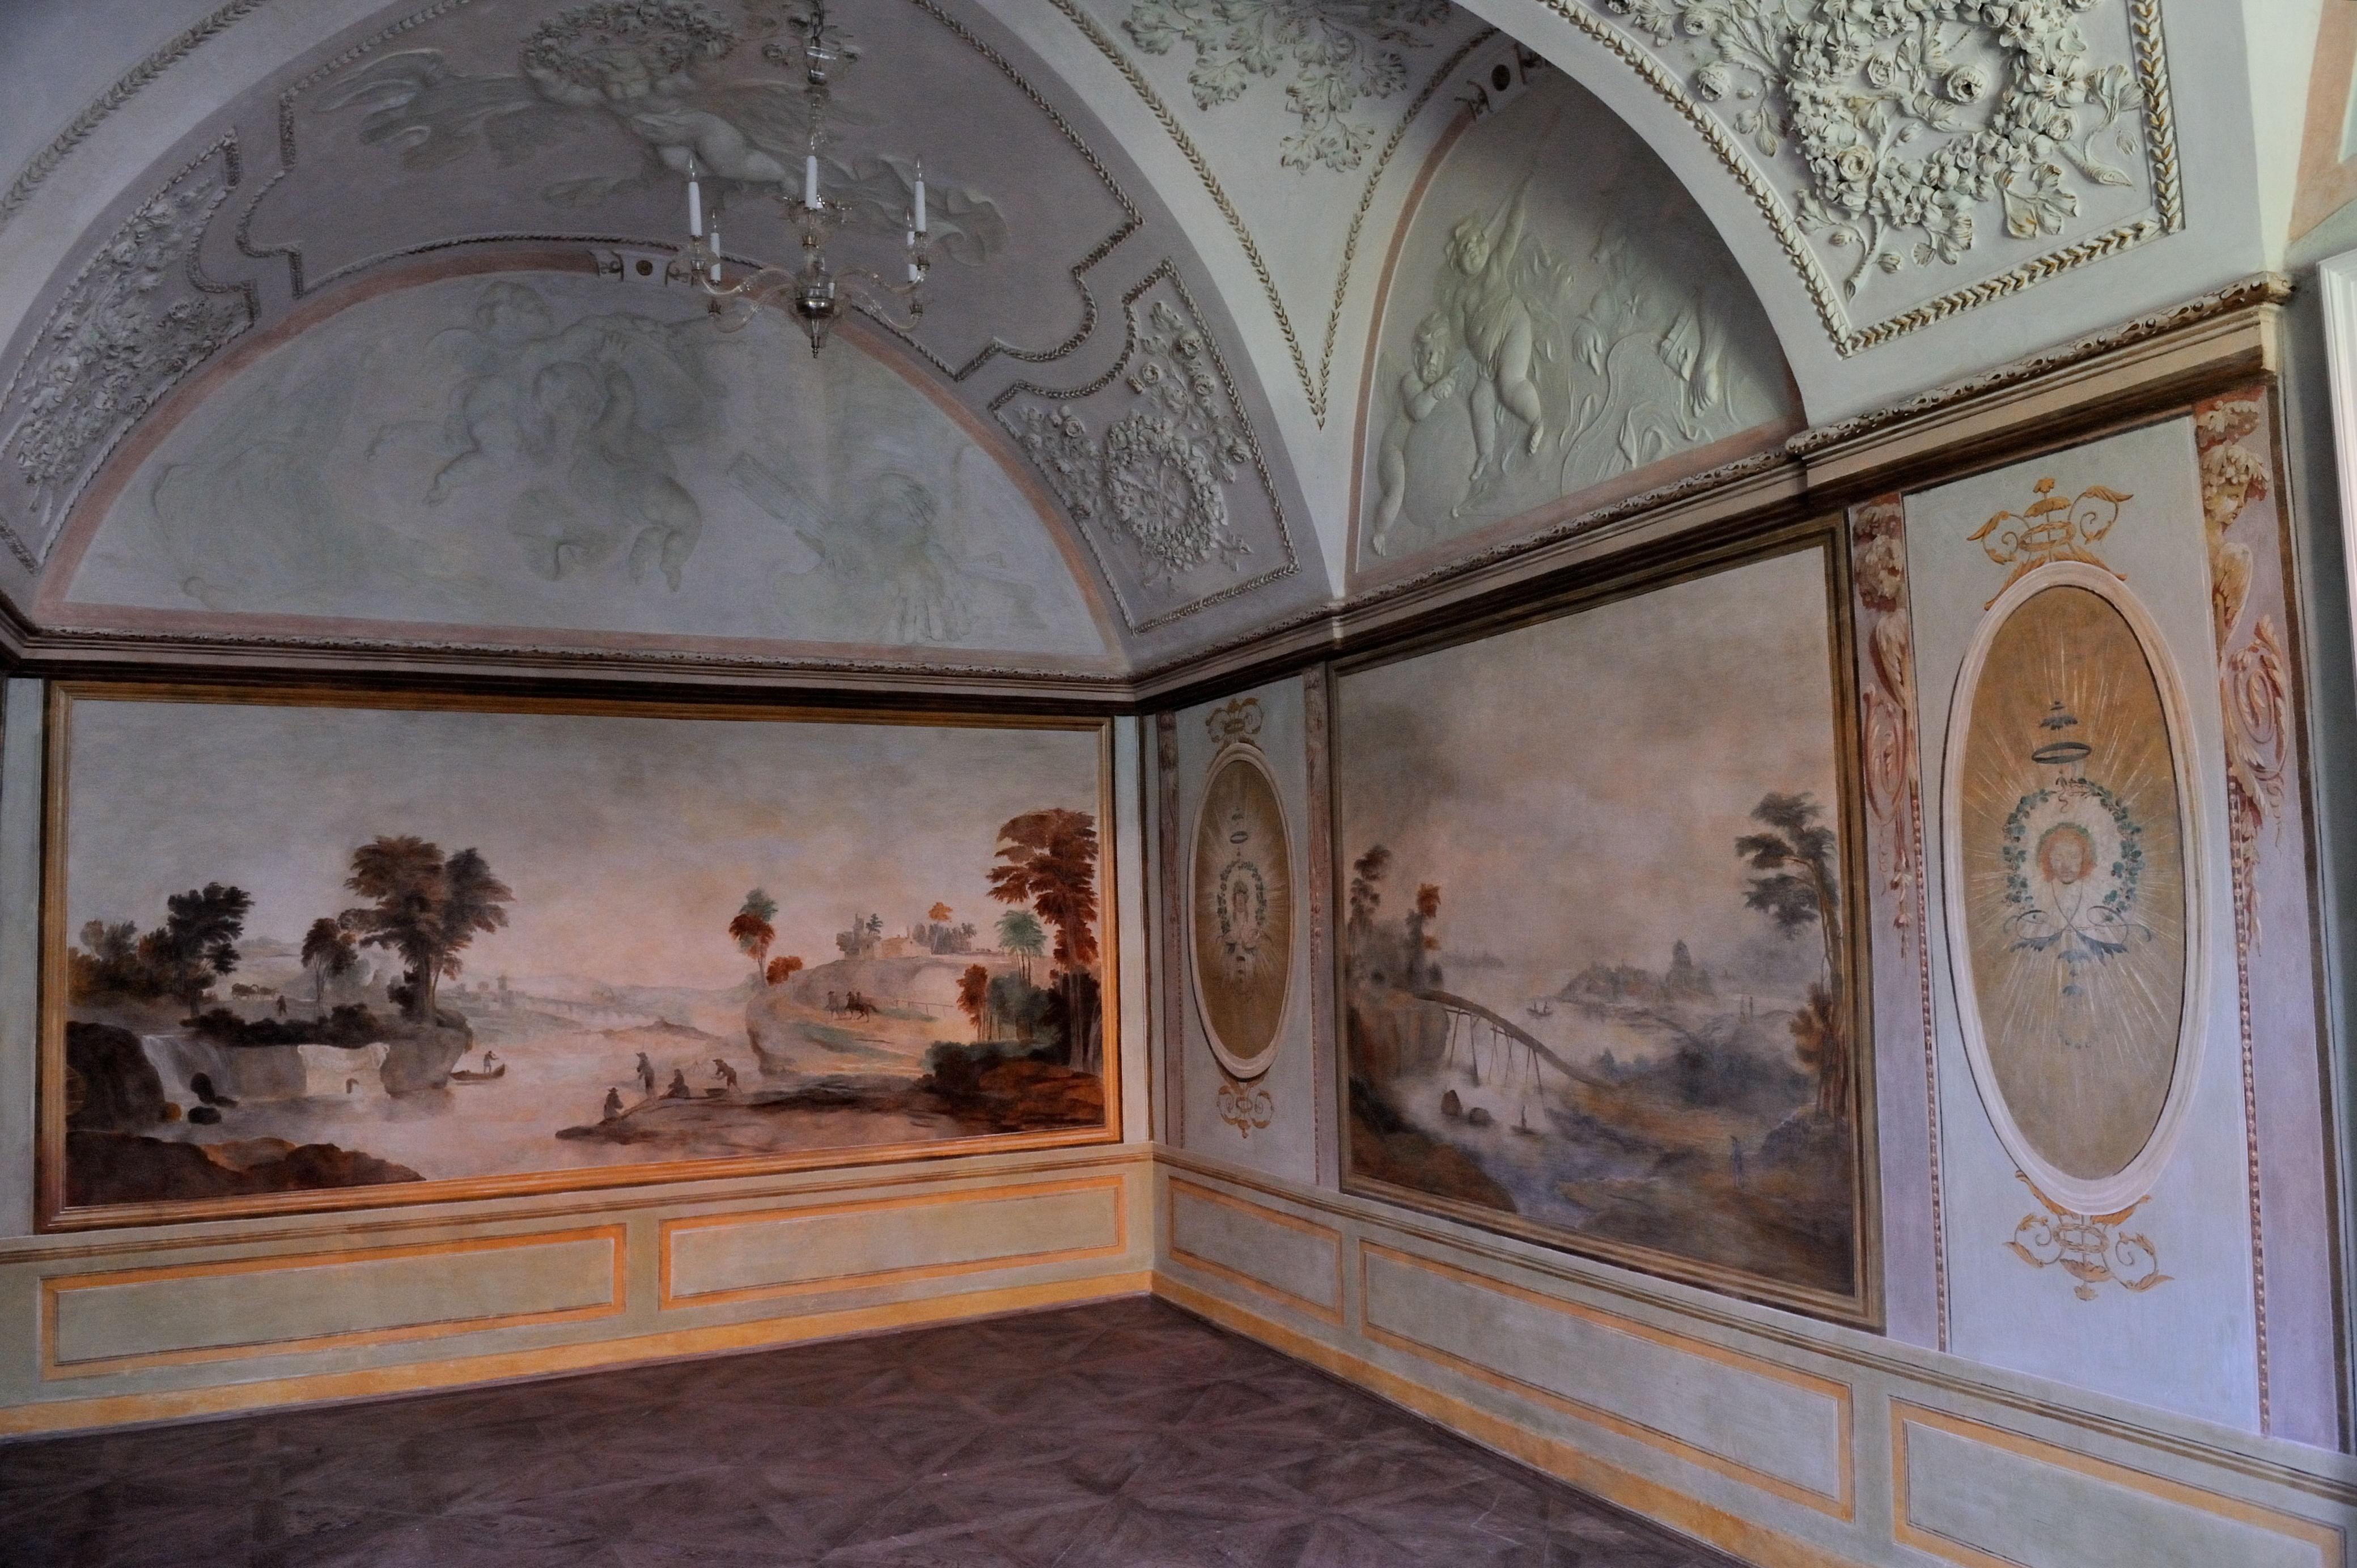 file:uherčice castle-stucco decorationbaldassarre fontana and